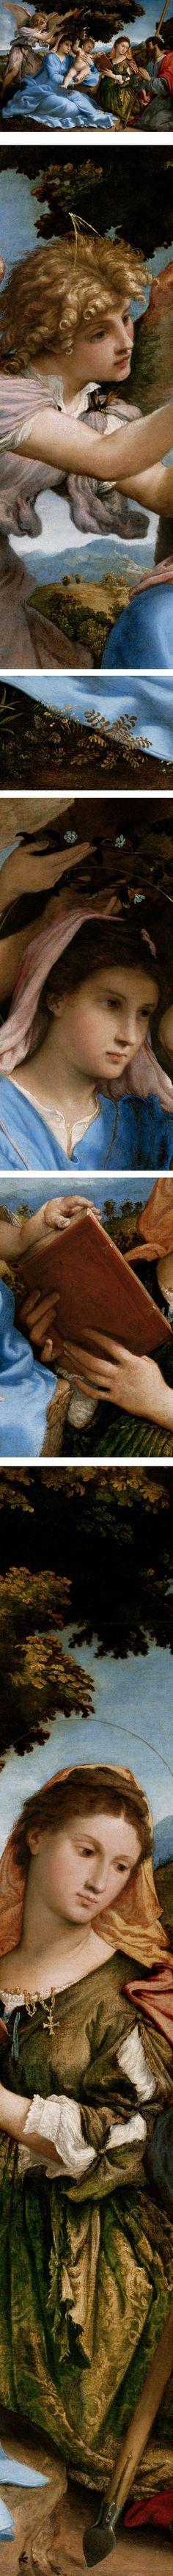 Madonna and Child with Saints Catherine and Thomas (sacra conversazione), Lorenzo Lotto